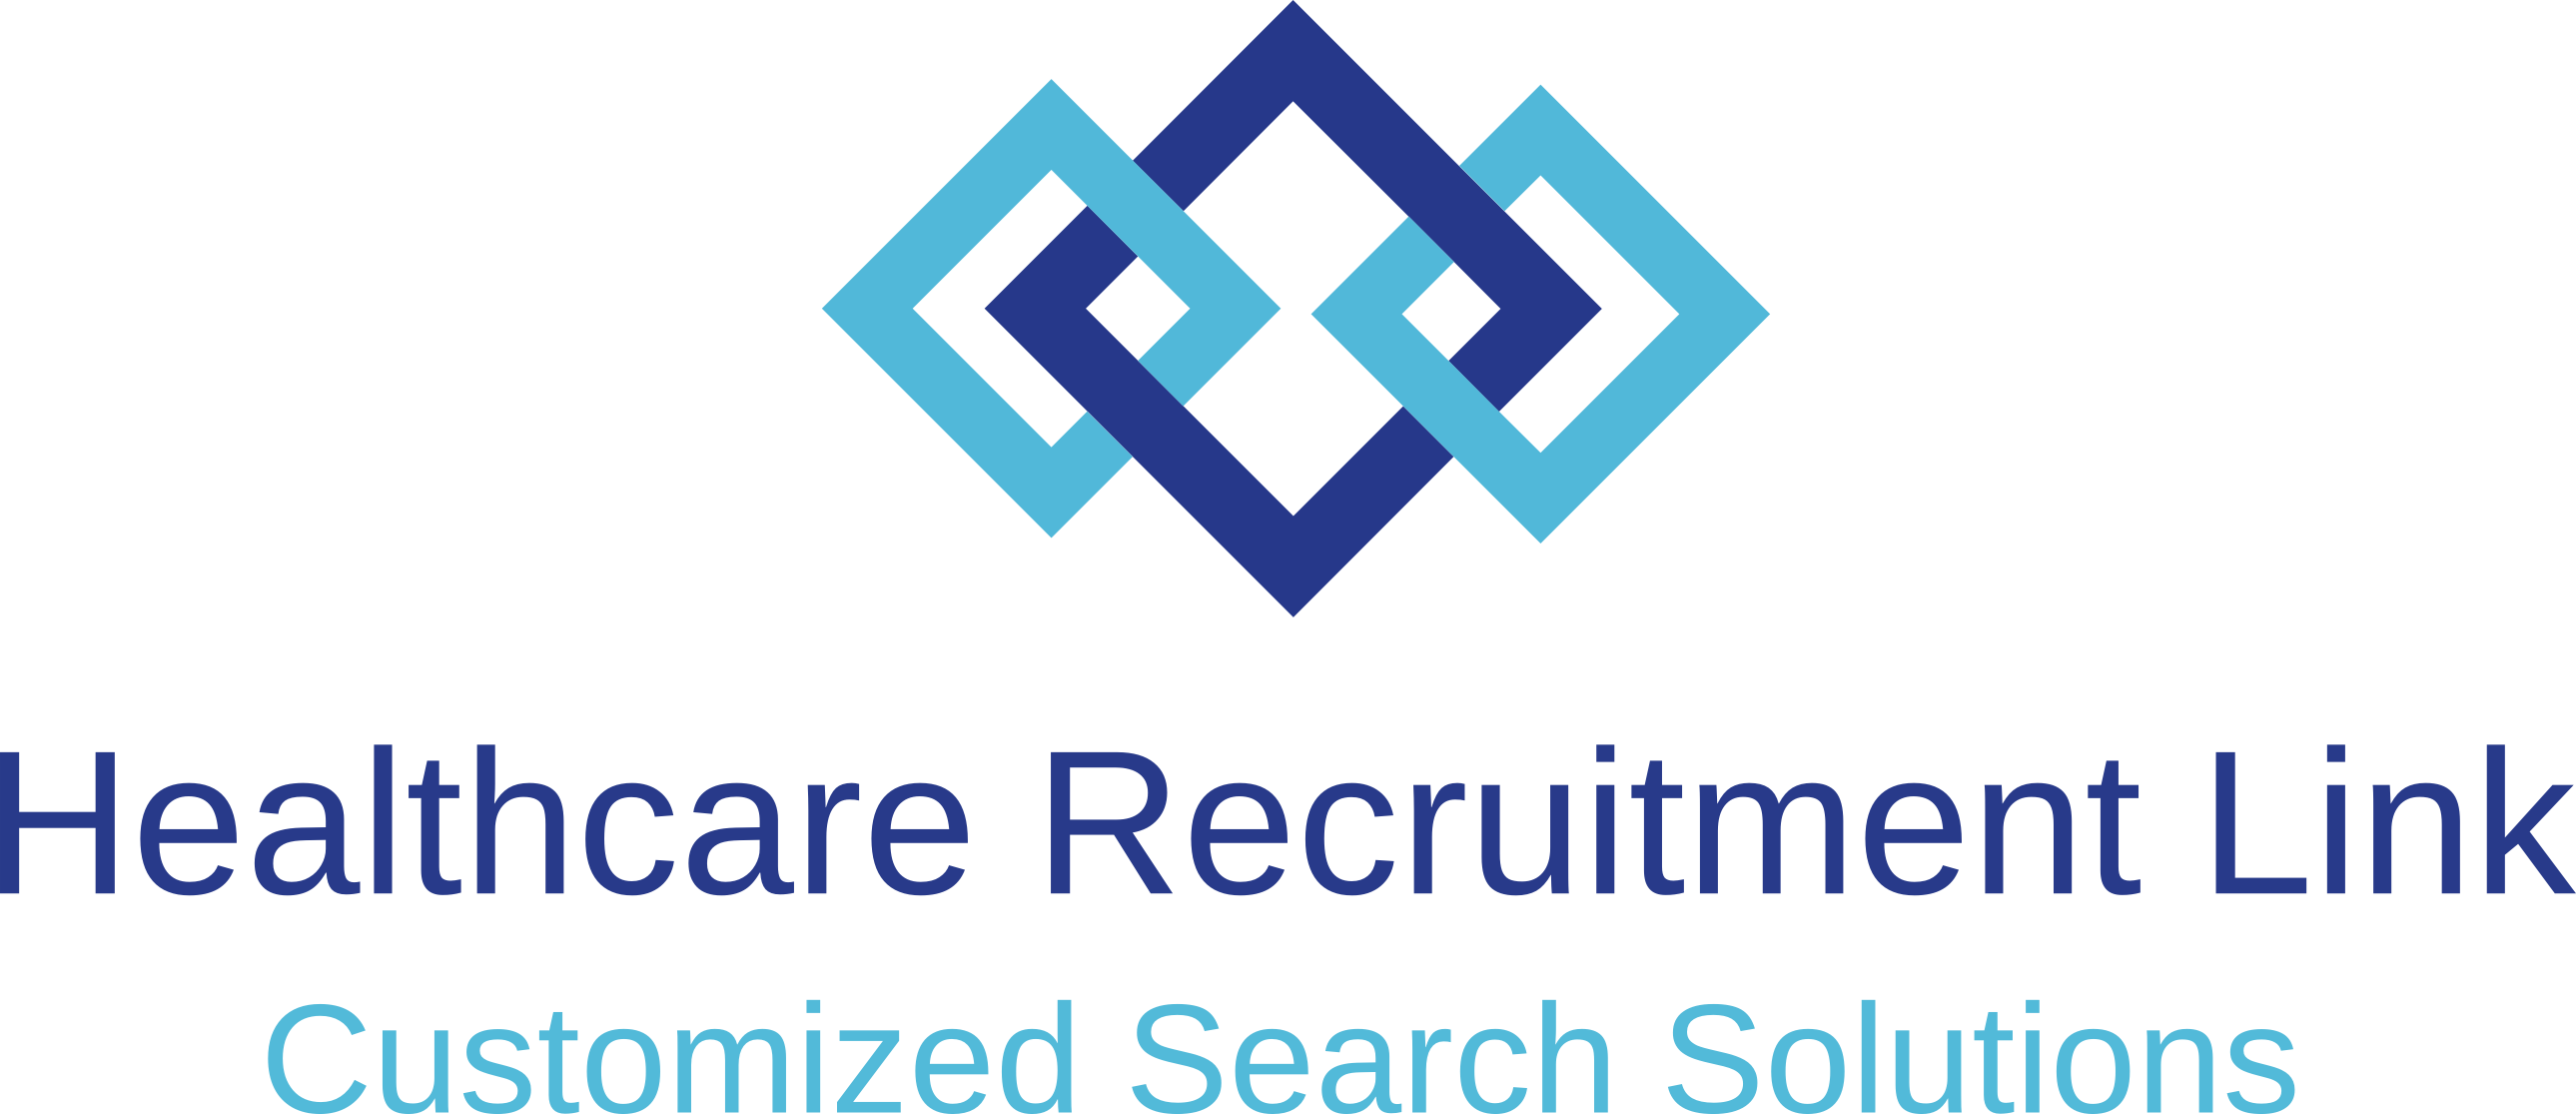 Healthcare Recruitment Link Logo